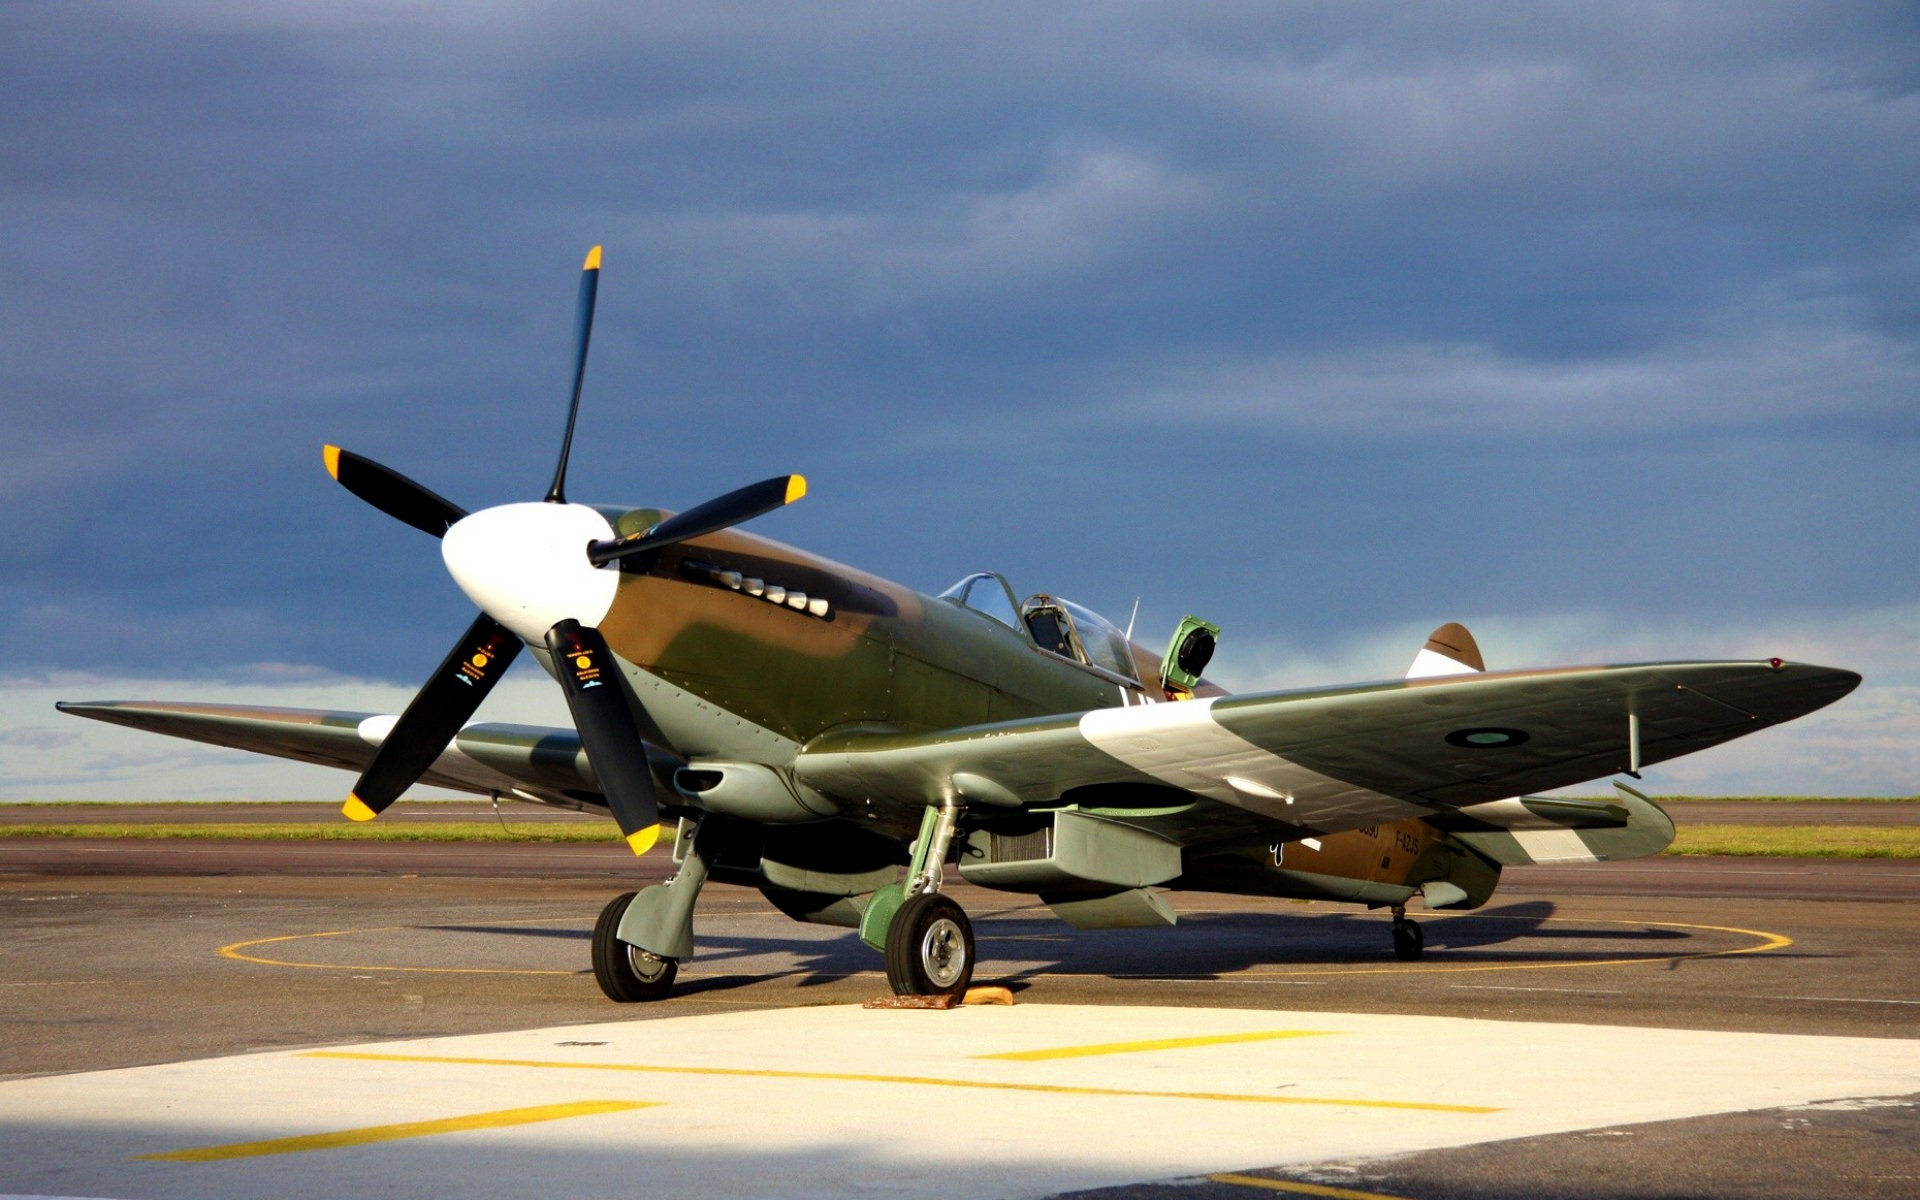 Una avioneta Spitfire - 1920x1200